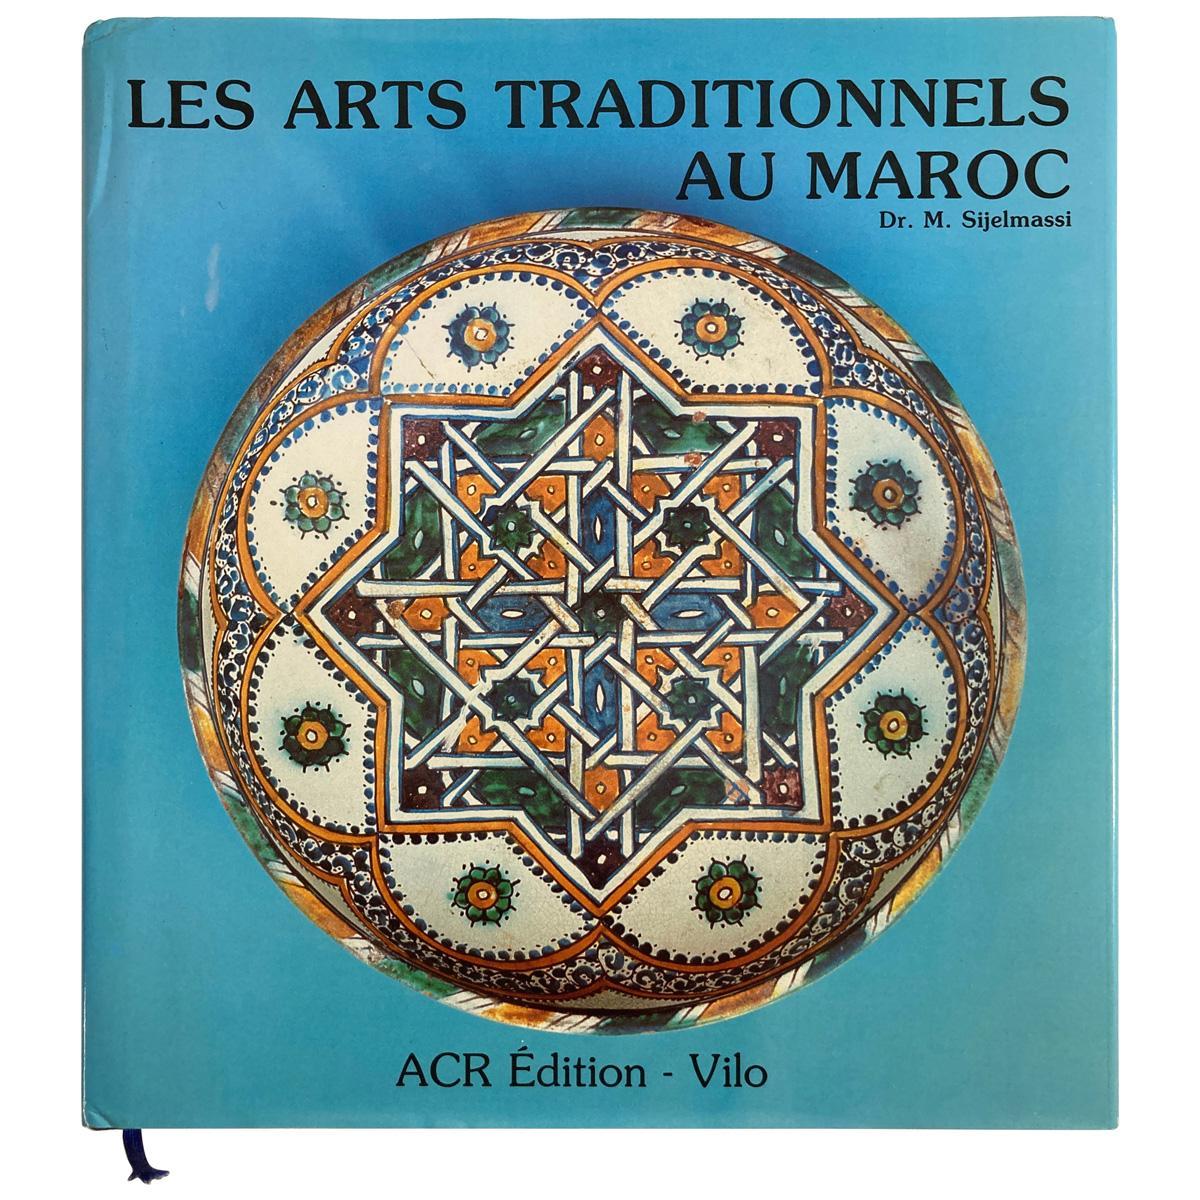 Les Arts Traditionnels au Maroc by Dr. M. Sijelmassi, Book